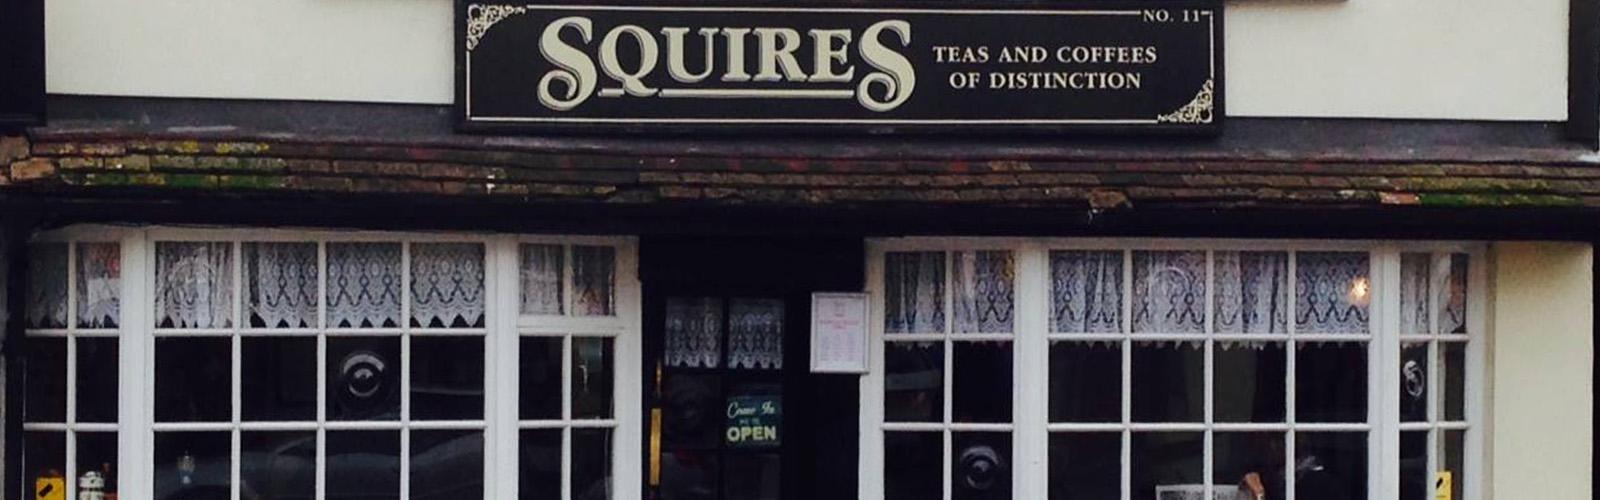 squirescoffeeslider-shop-front